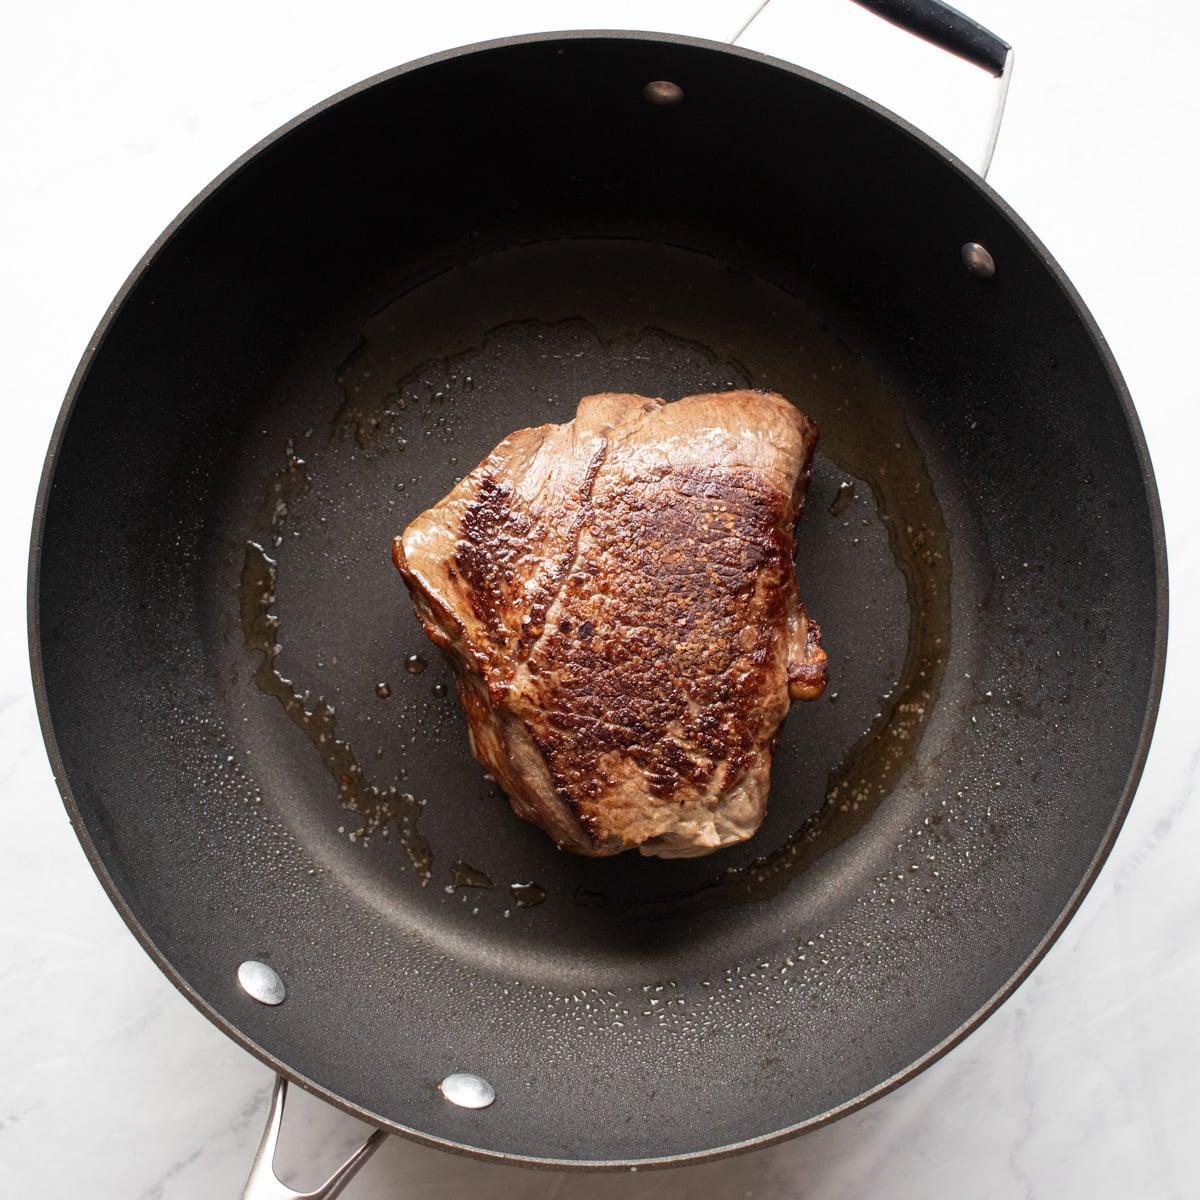 Seared beef roast in a skillet